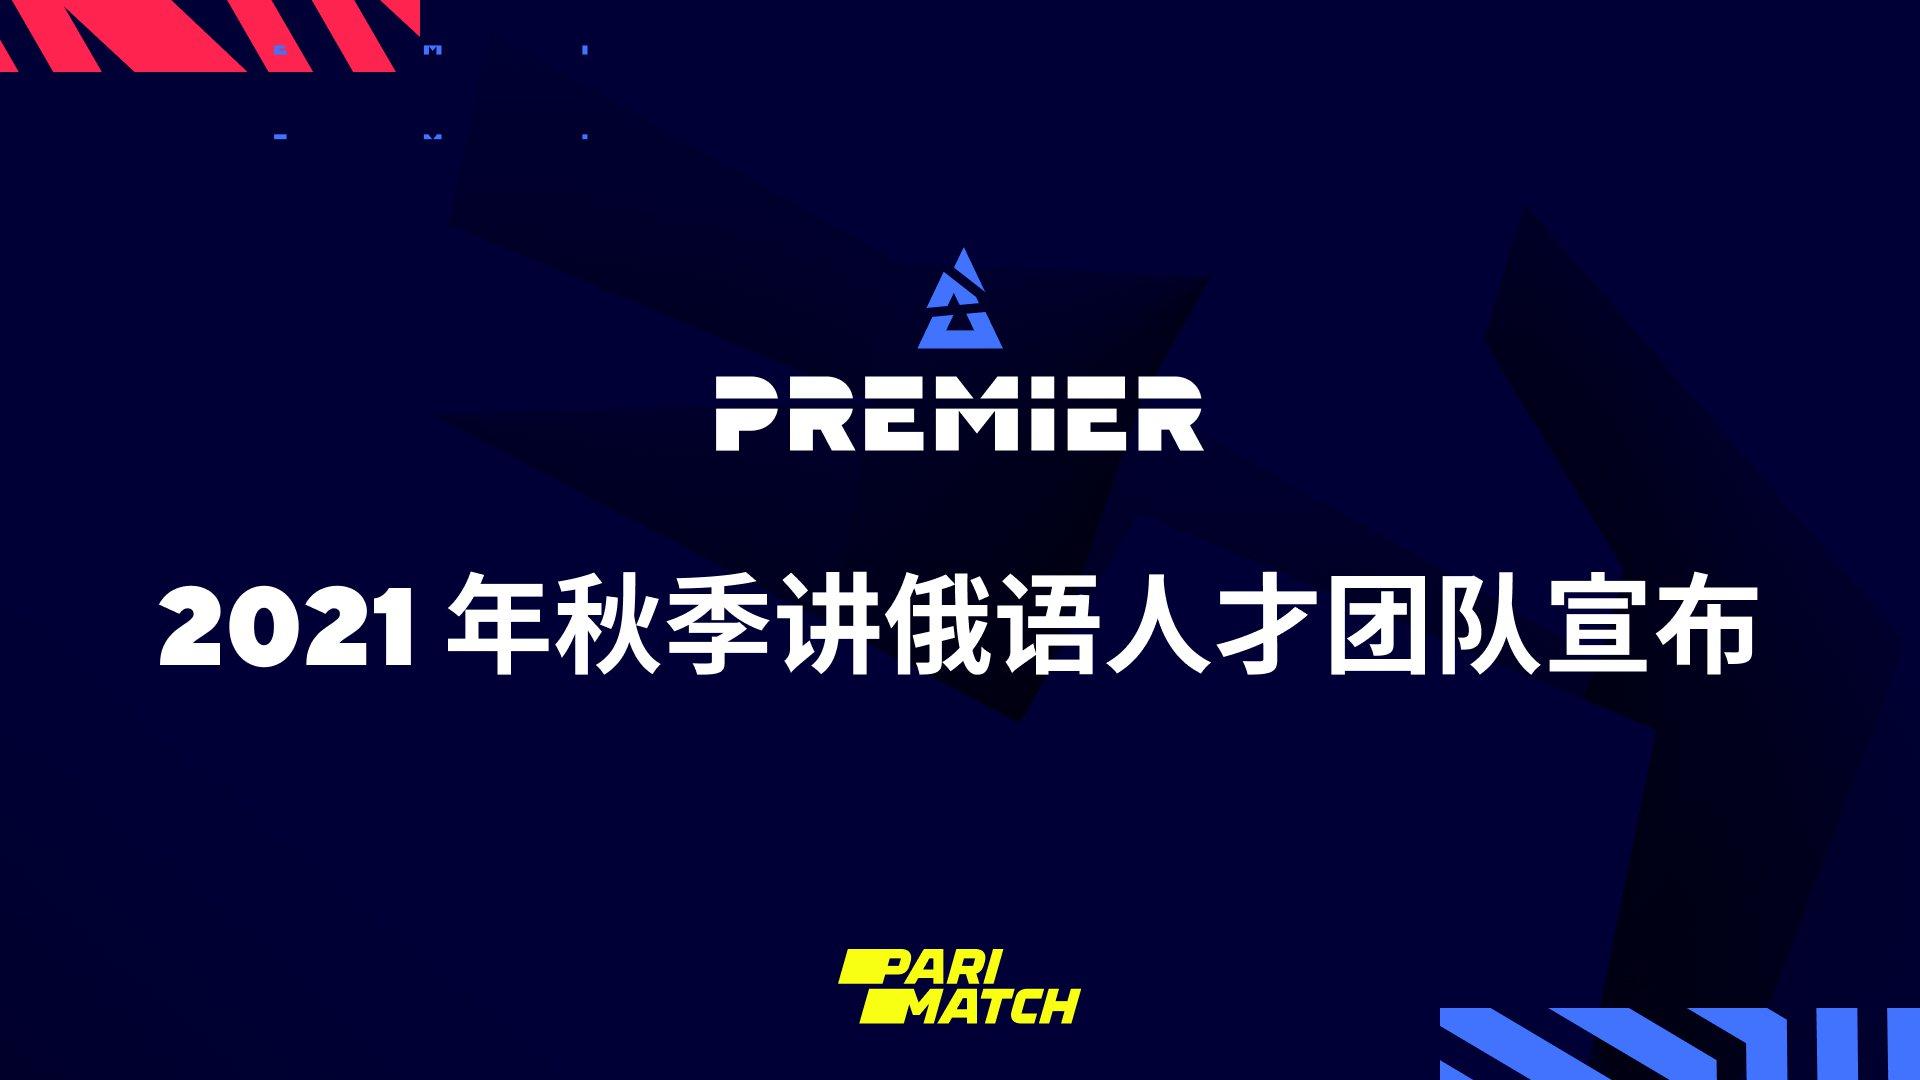 BLAST Premier:2021 年秋季讲俄语人才团队宣布。 图象:WePlay Holding